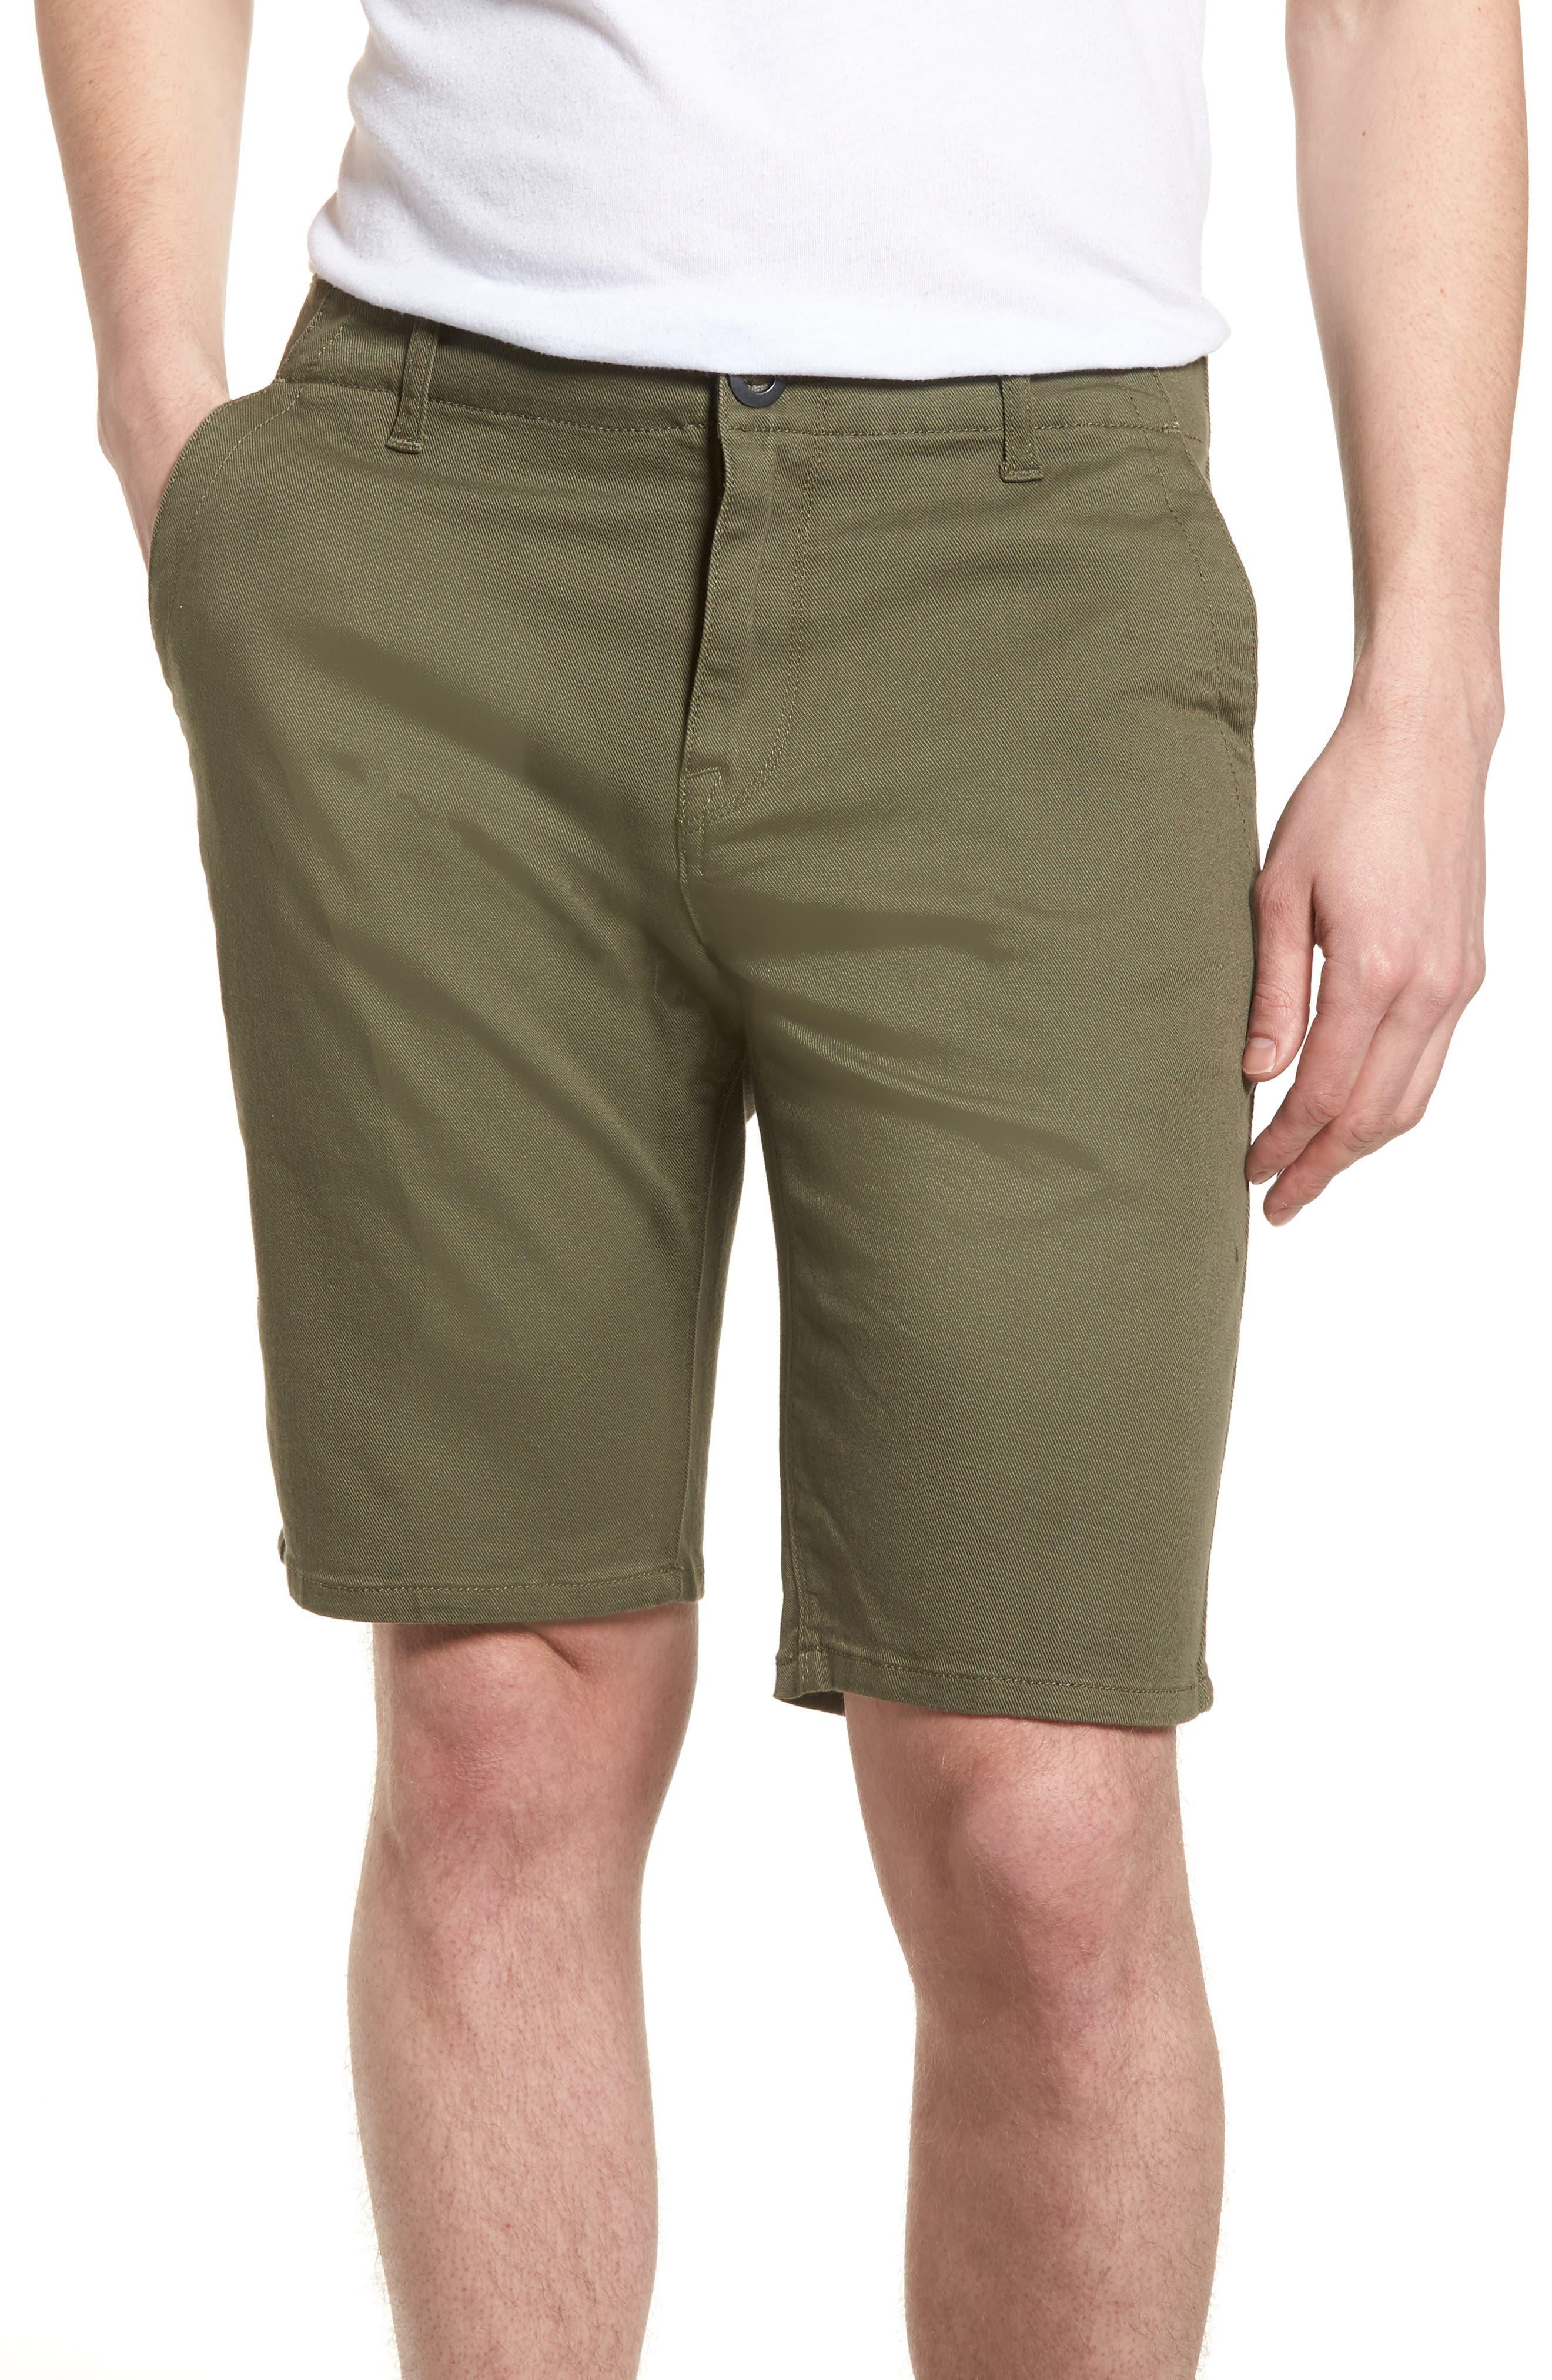 VSM Prowler Shorts,                             Main thumbnail 1, color,                             Military